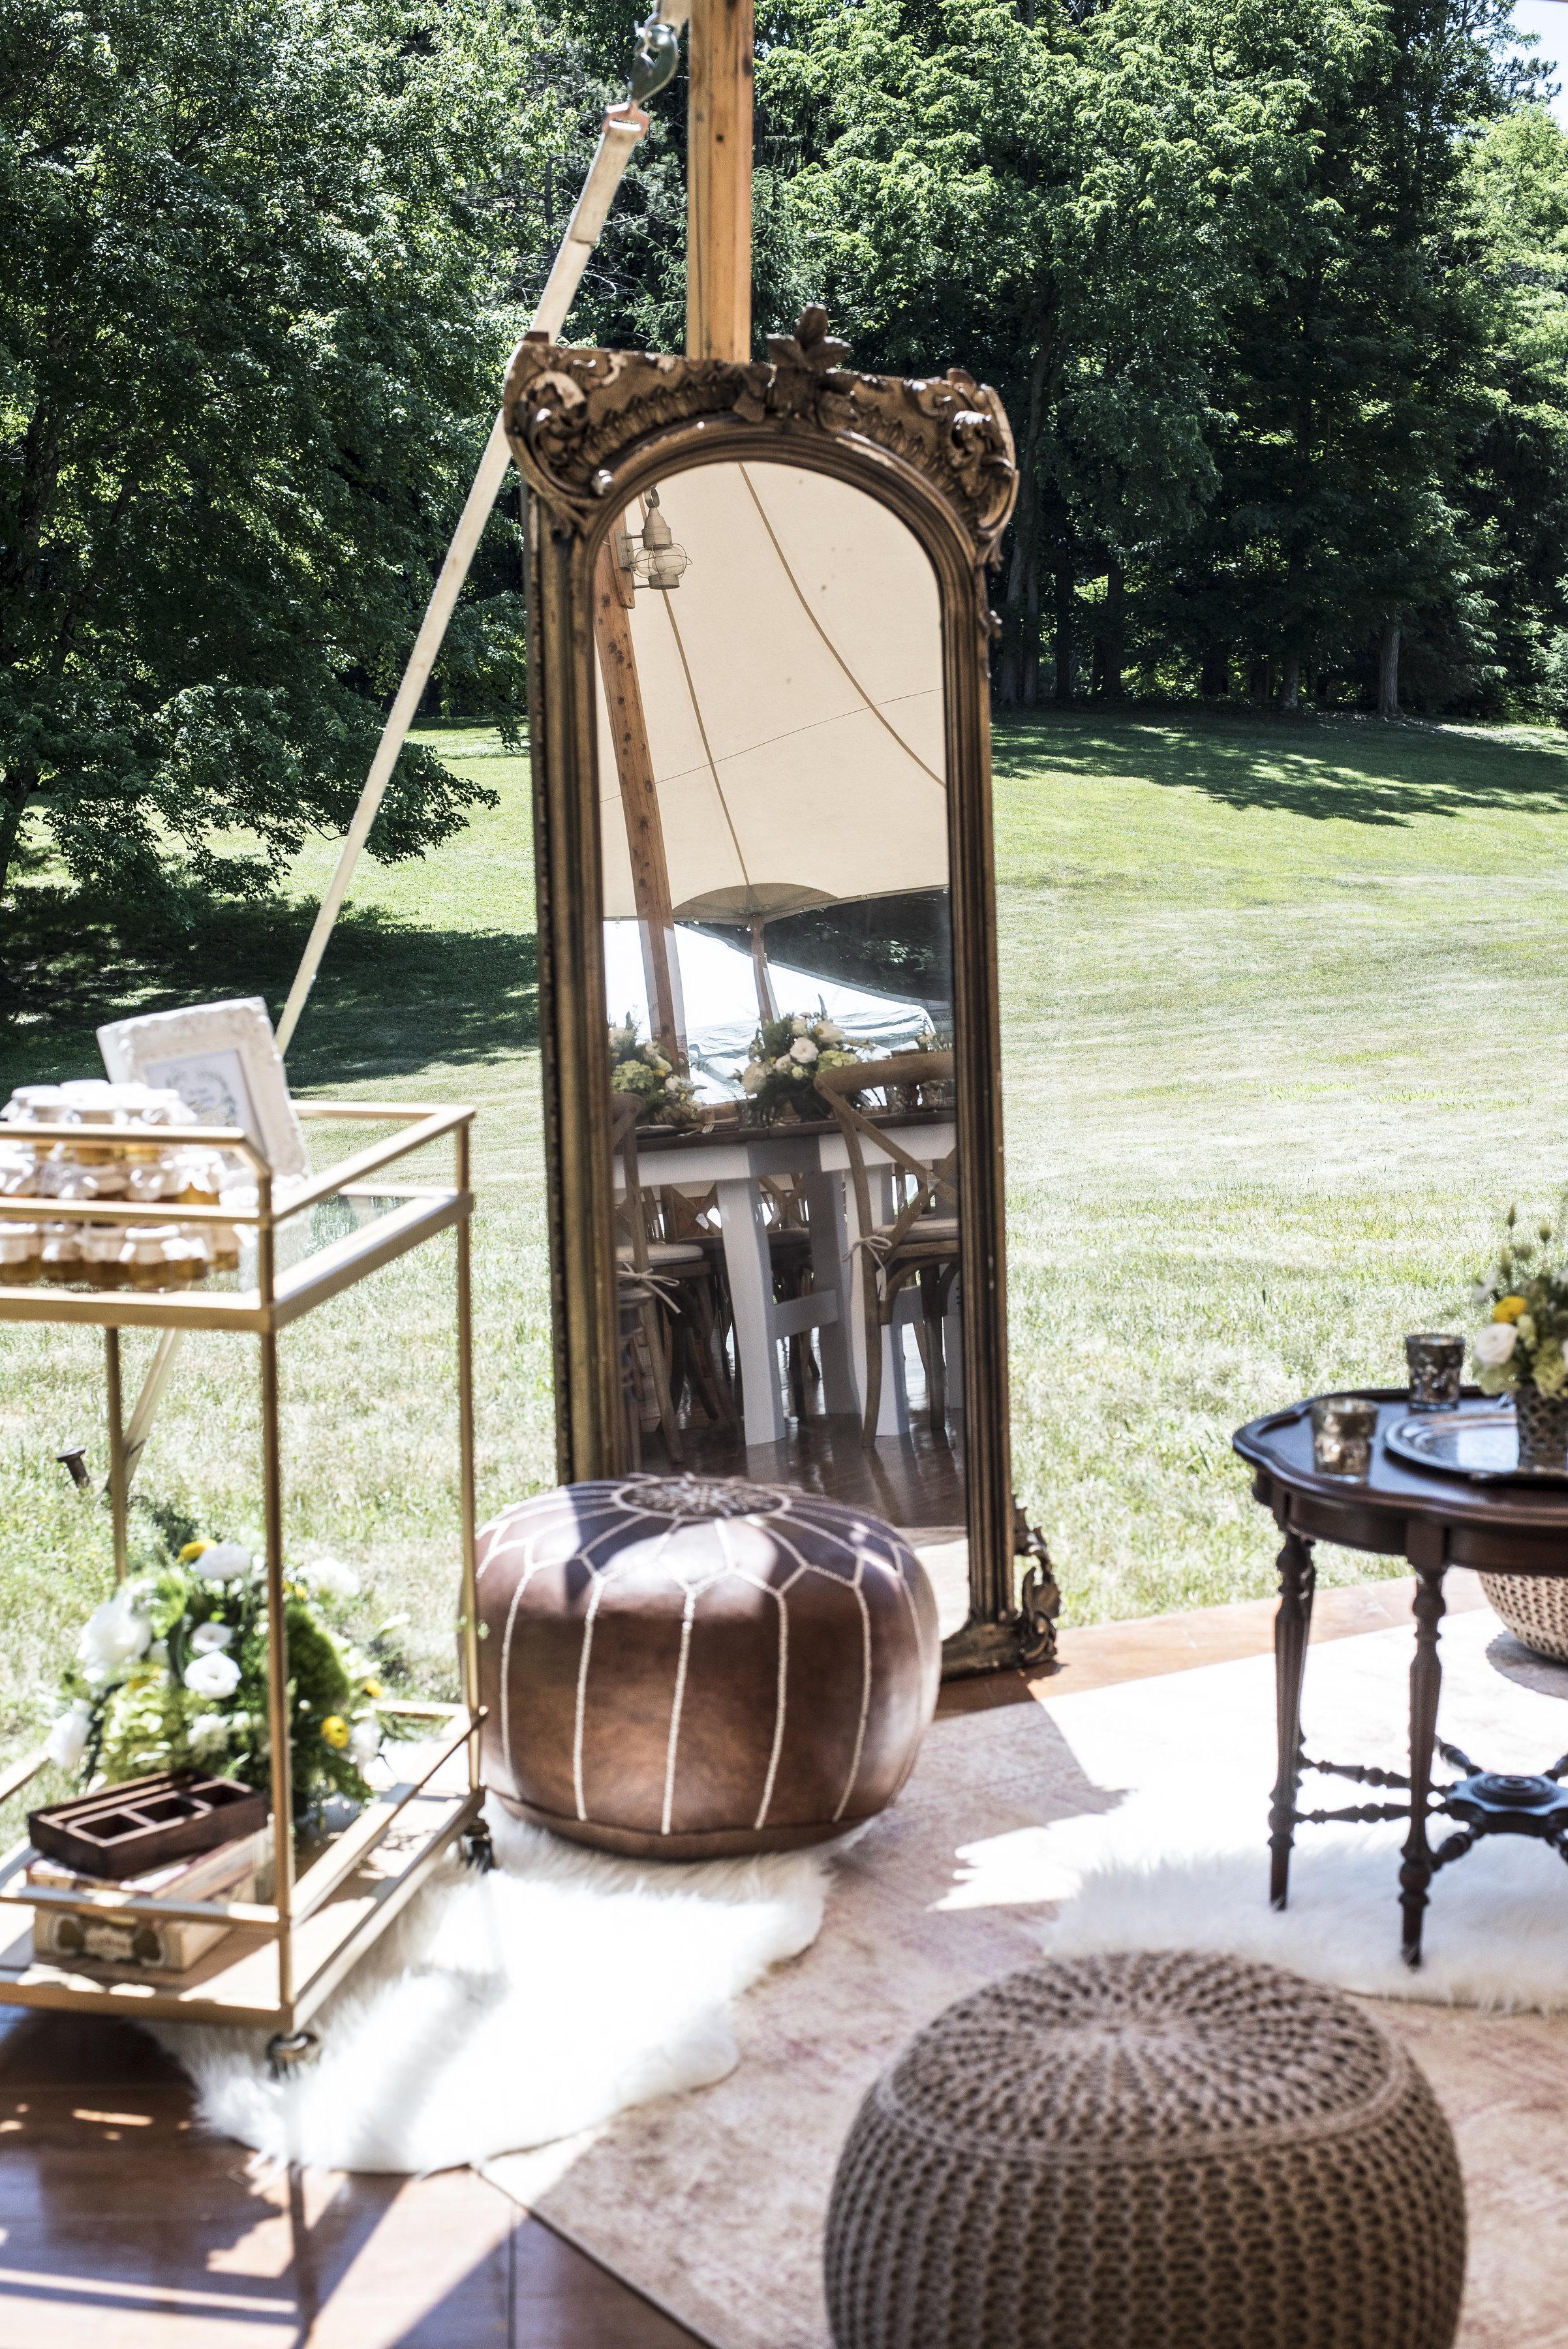 Andrea-Freeman-Events-Social-Event-Summer-Party-Rhinebeck-NY-2.JPG